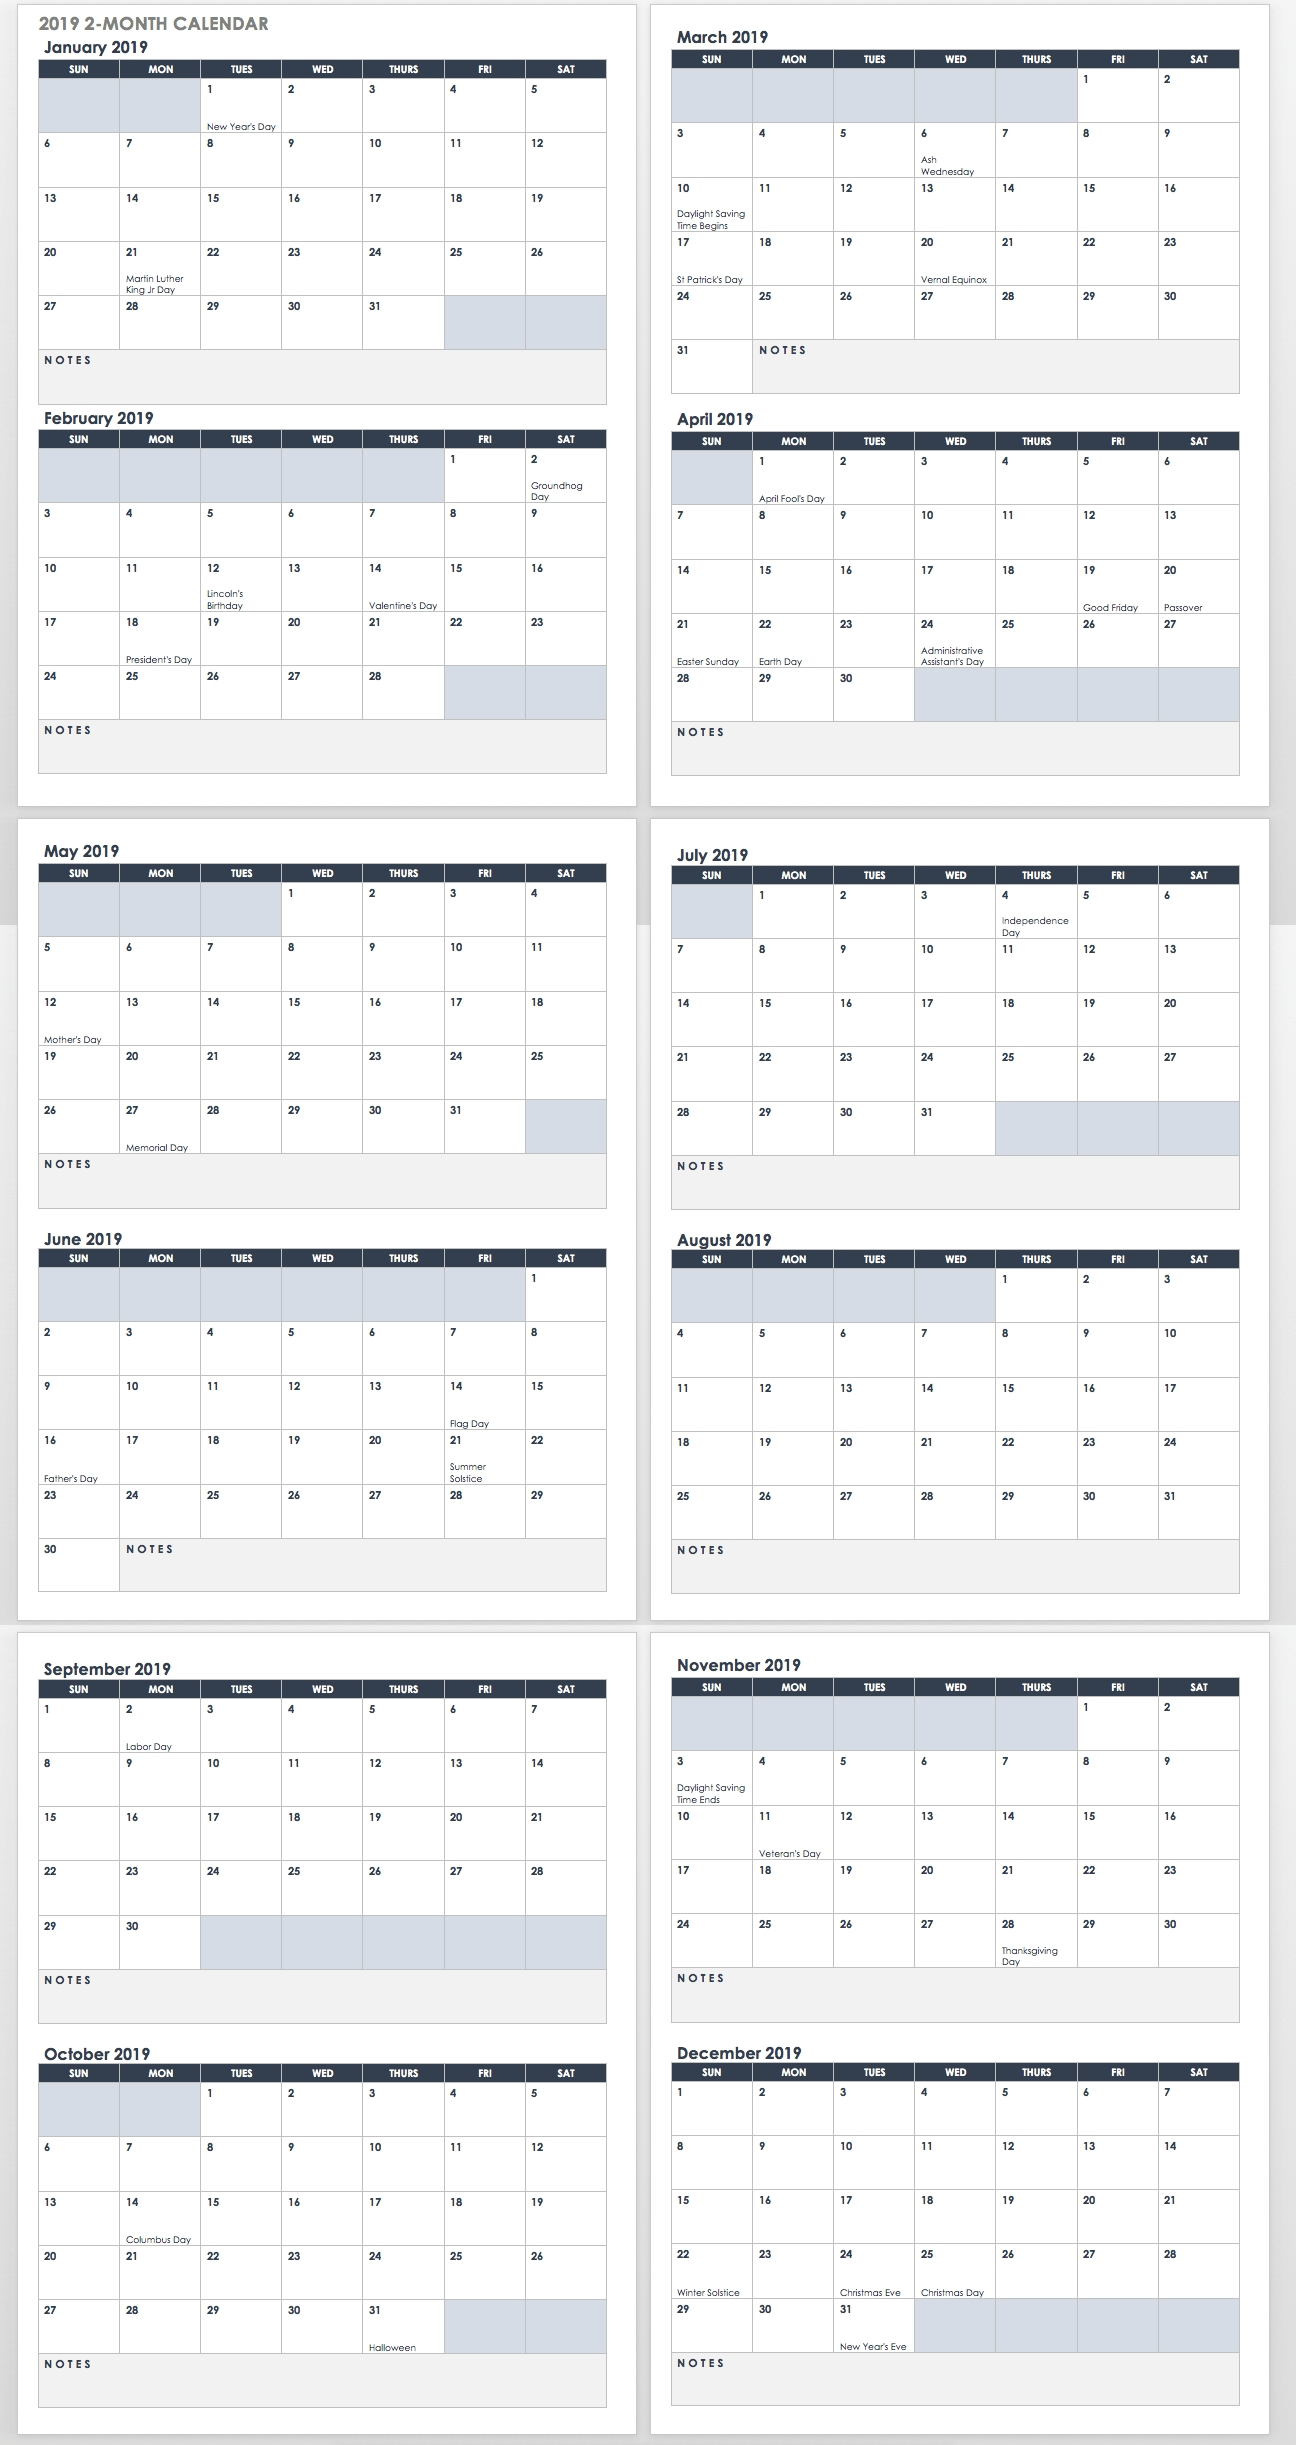 15 Free Monthly Calendar Templates | Smartsheet for Template For Calendar By Month